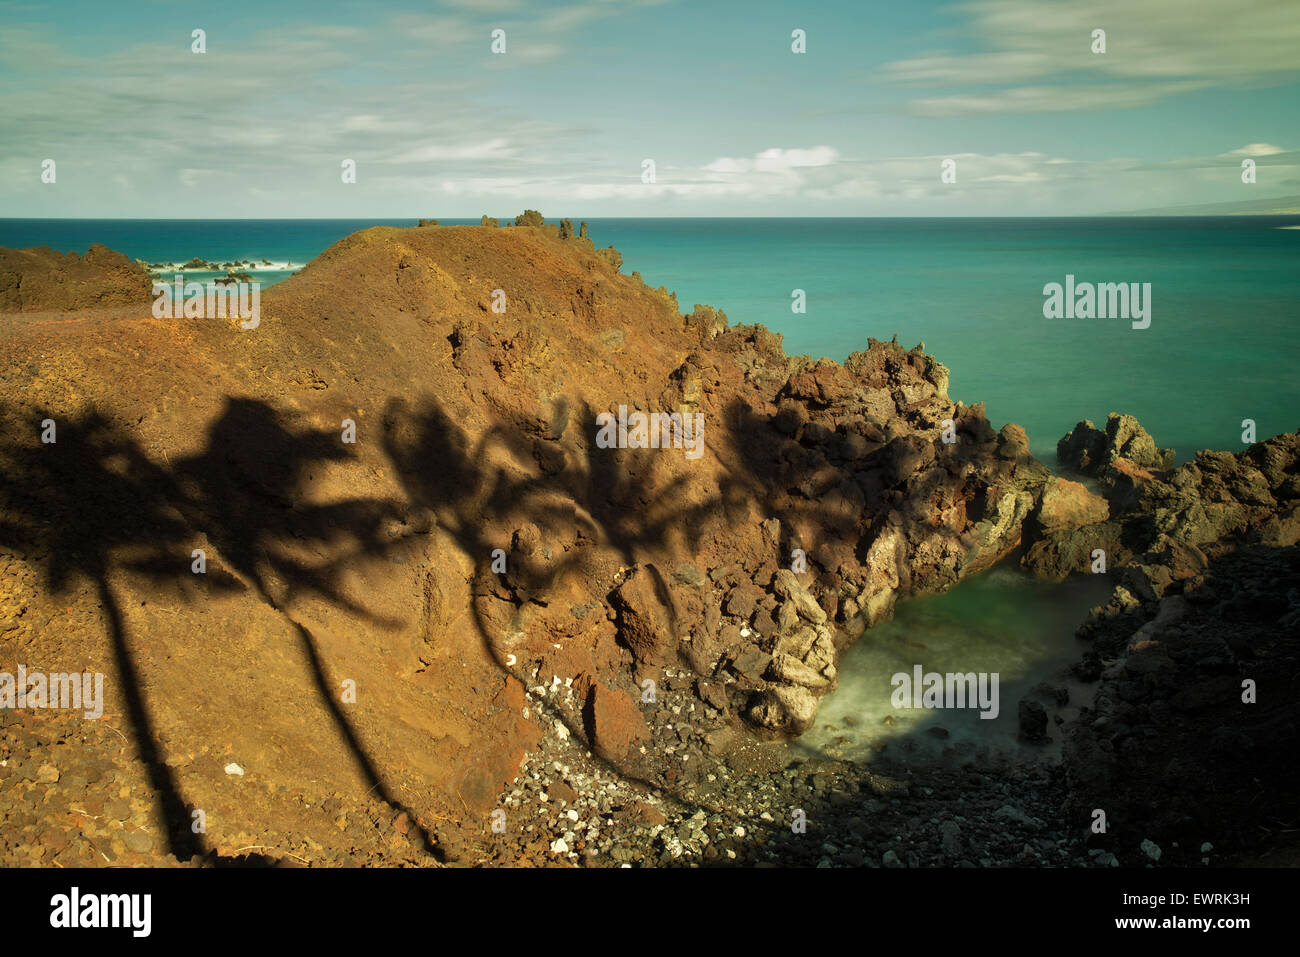 Palm tree shadows and ocean. Hawaii, The Big Island. - Stock Image